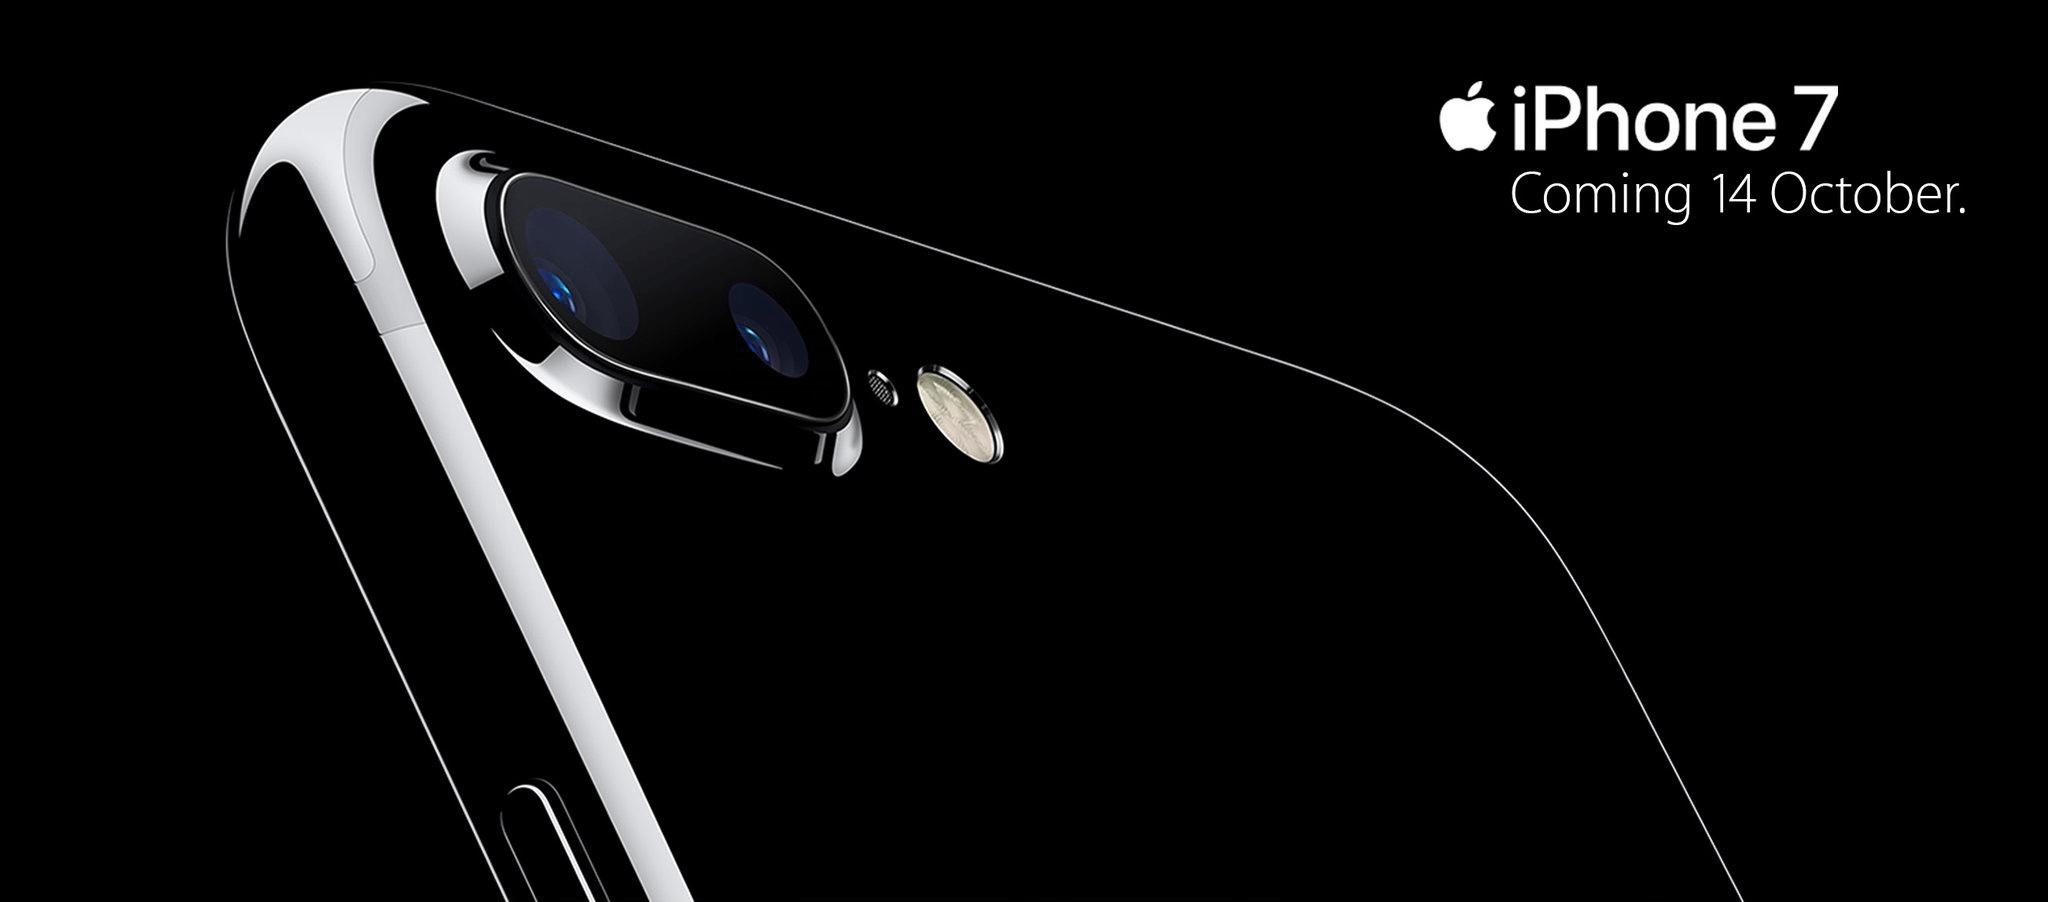 iPhone 7 Vodacom pre-orders iPhone 7